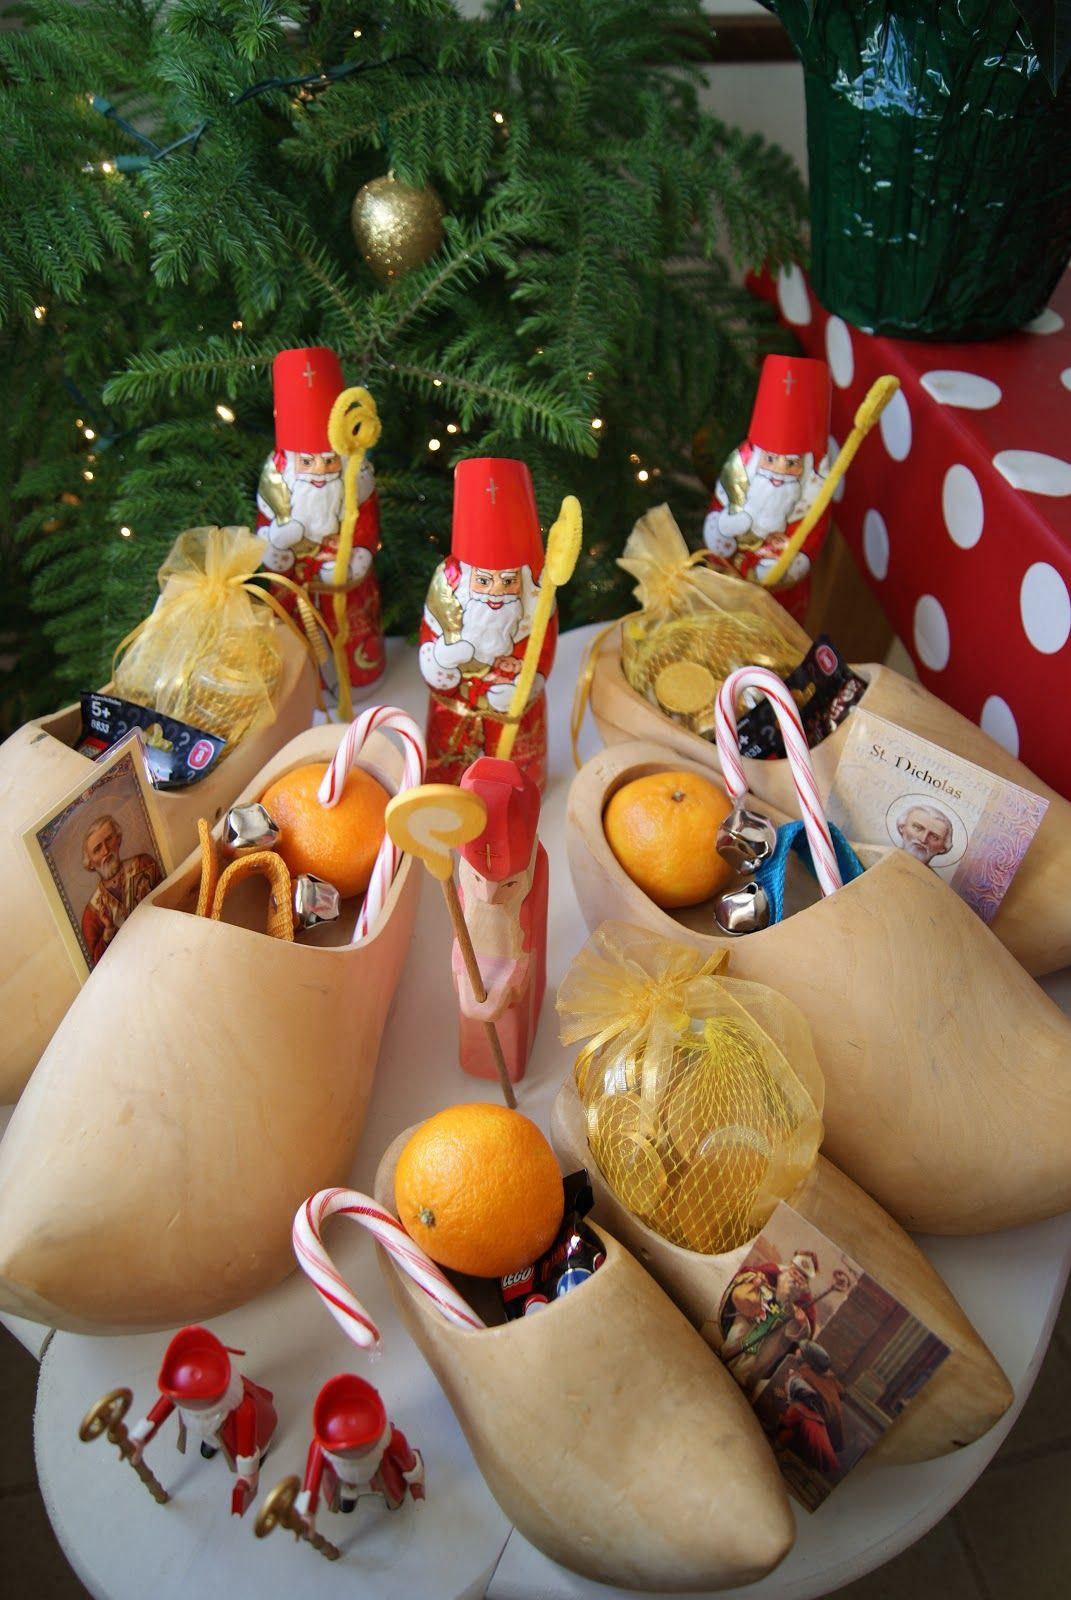 classic st Nicholas loot -- oranges, candy canes, chocolate santas, gold coins.